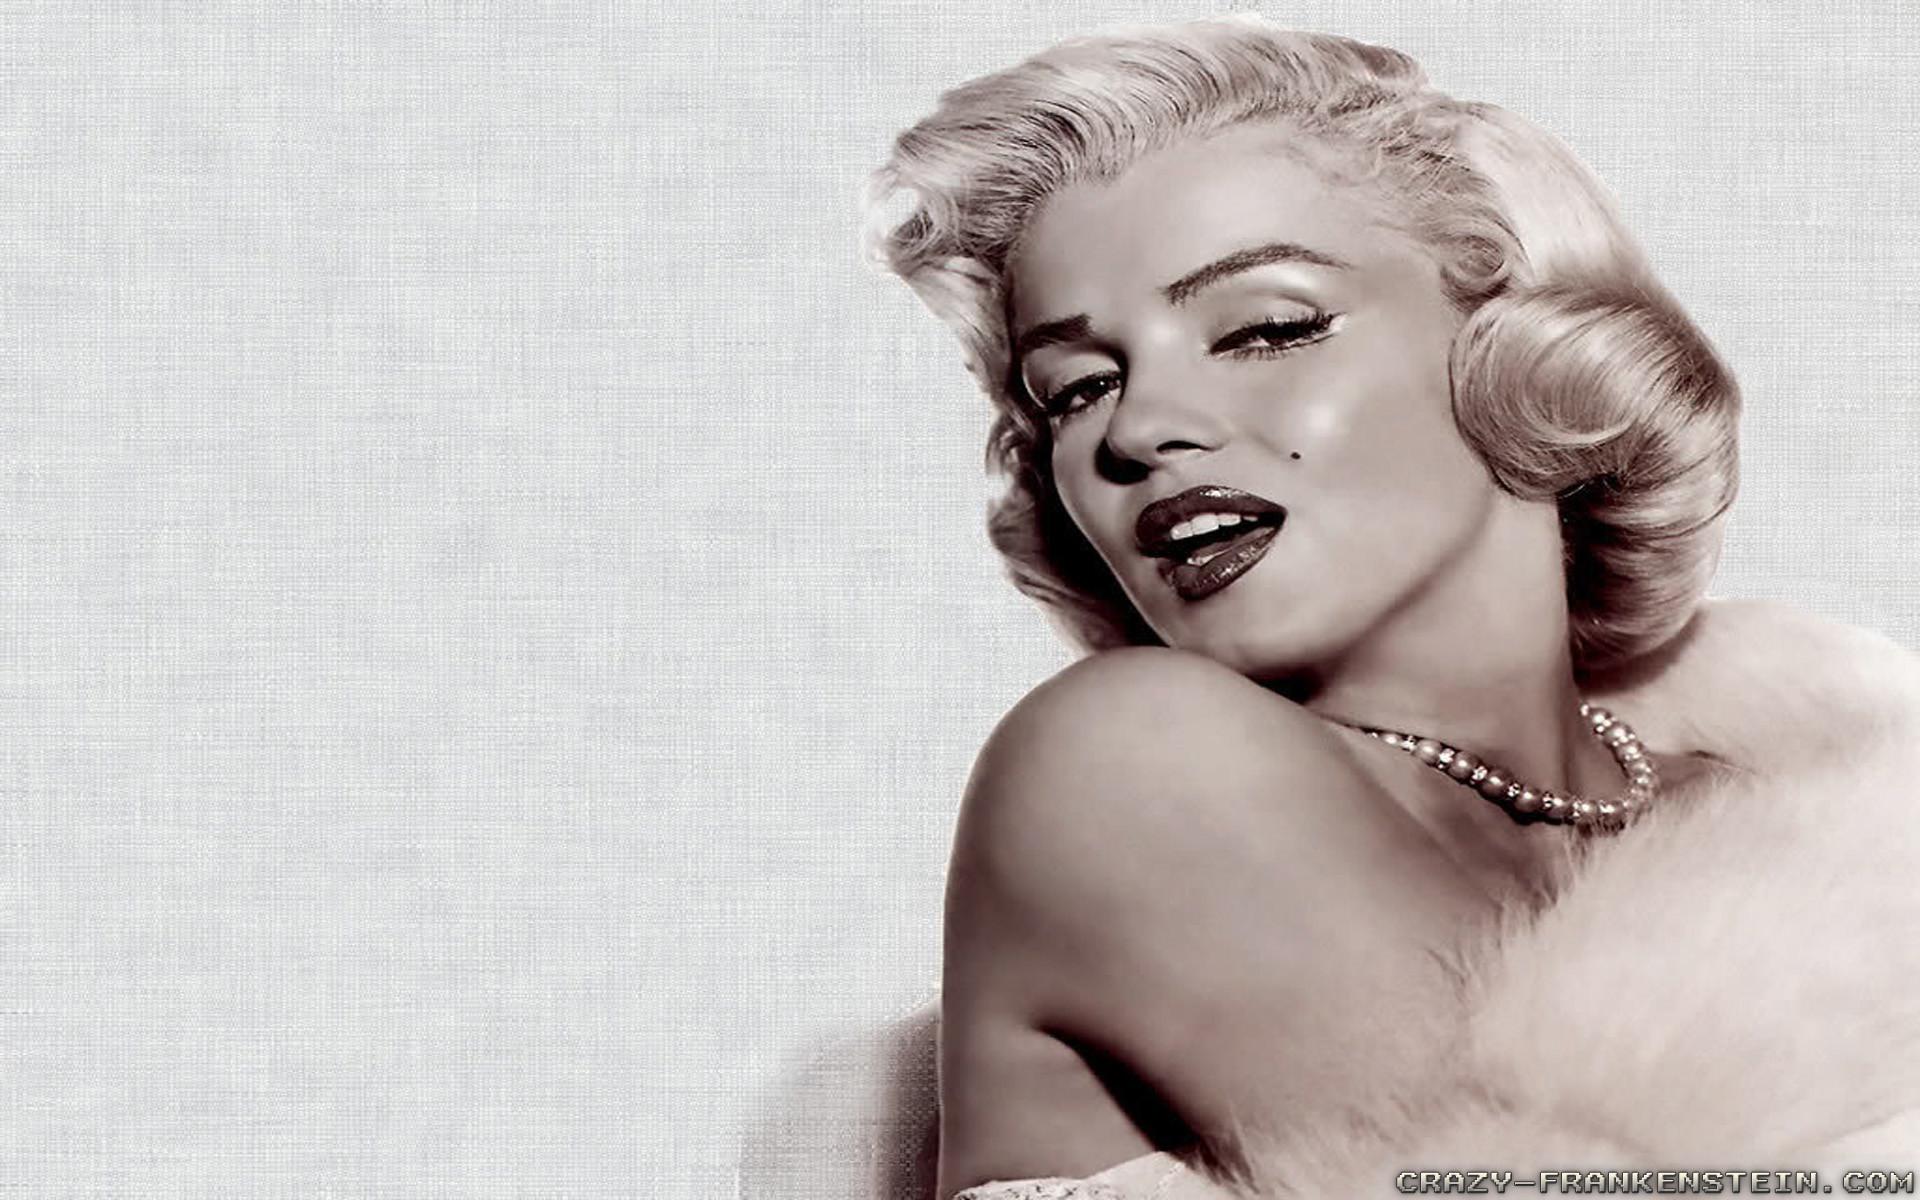 Videos · Home > Wallpapers > Female celebrity wallpapers · Marilyn Monroe  …